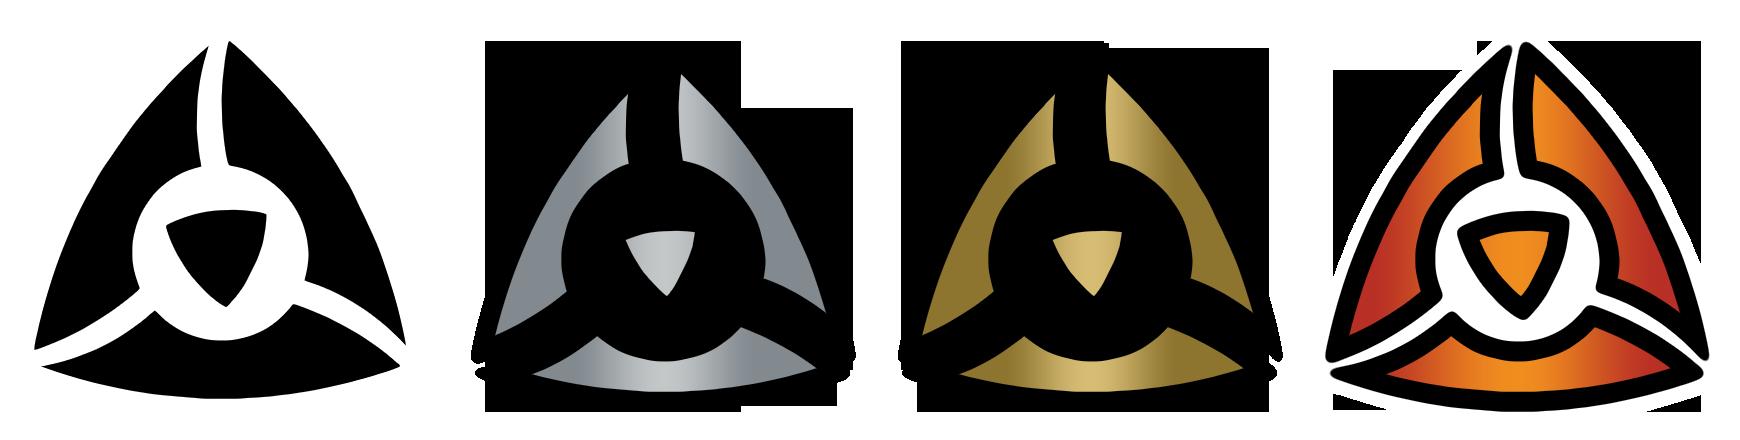 New Extension Symbol !